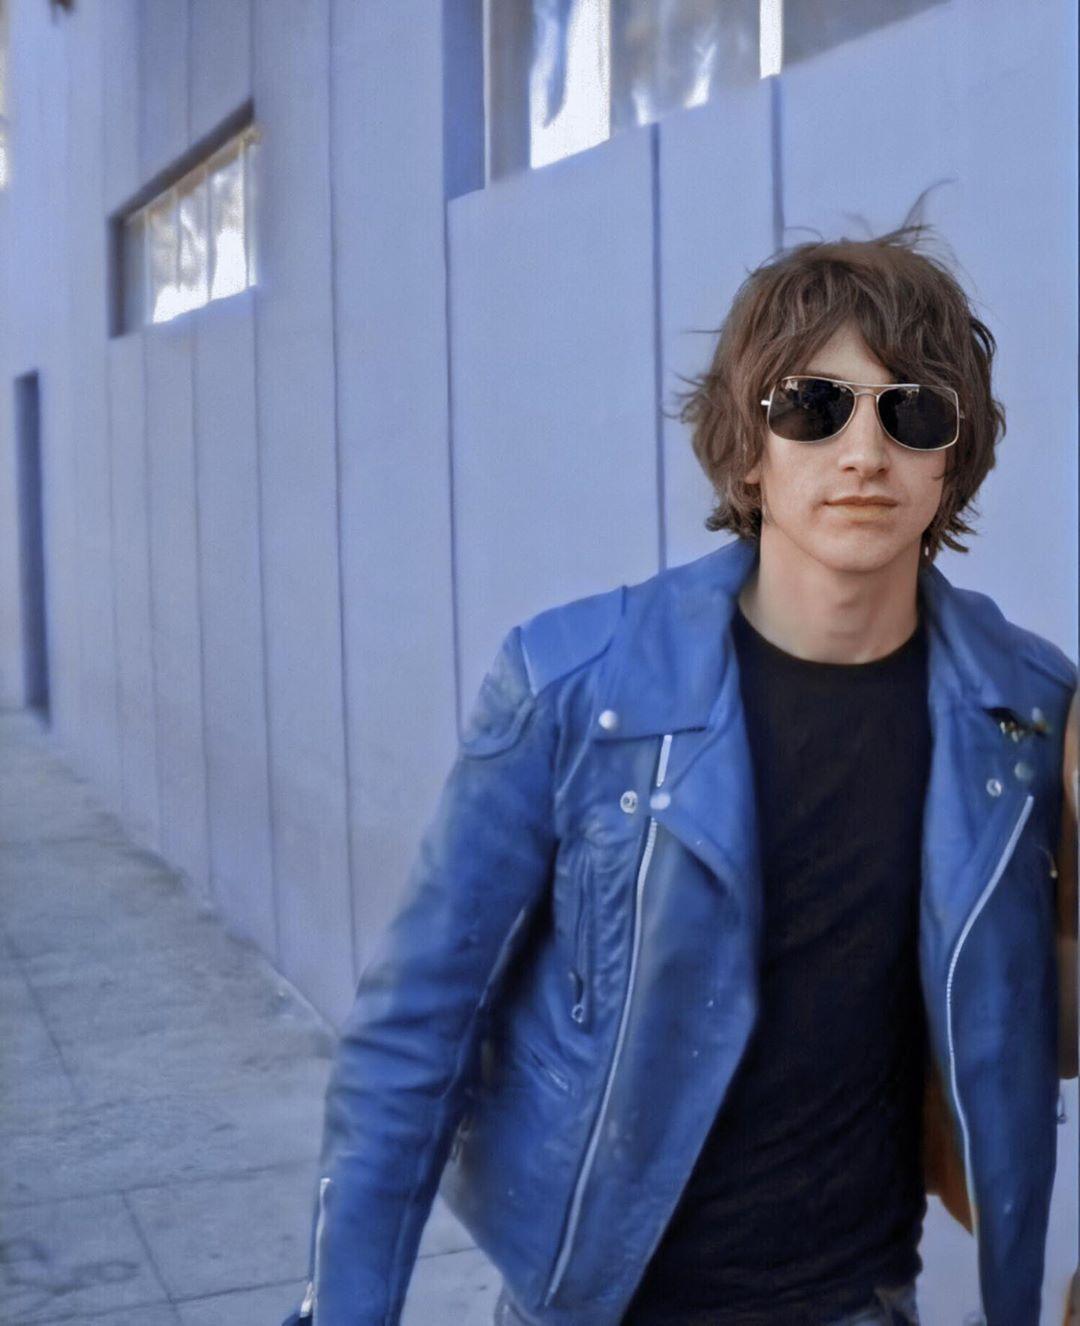 Alex Turner S Instagram Profile Post Same Jacket Alexturner Arcticmonkeys Alex Turner Blue Leather Jacket Arctic Monkeys [ 1326 x 1080 Pixel ]